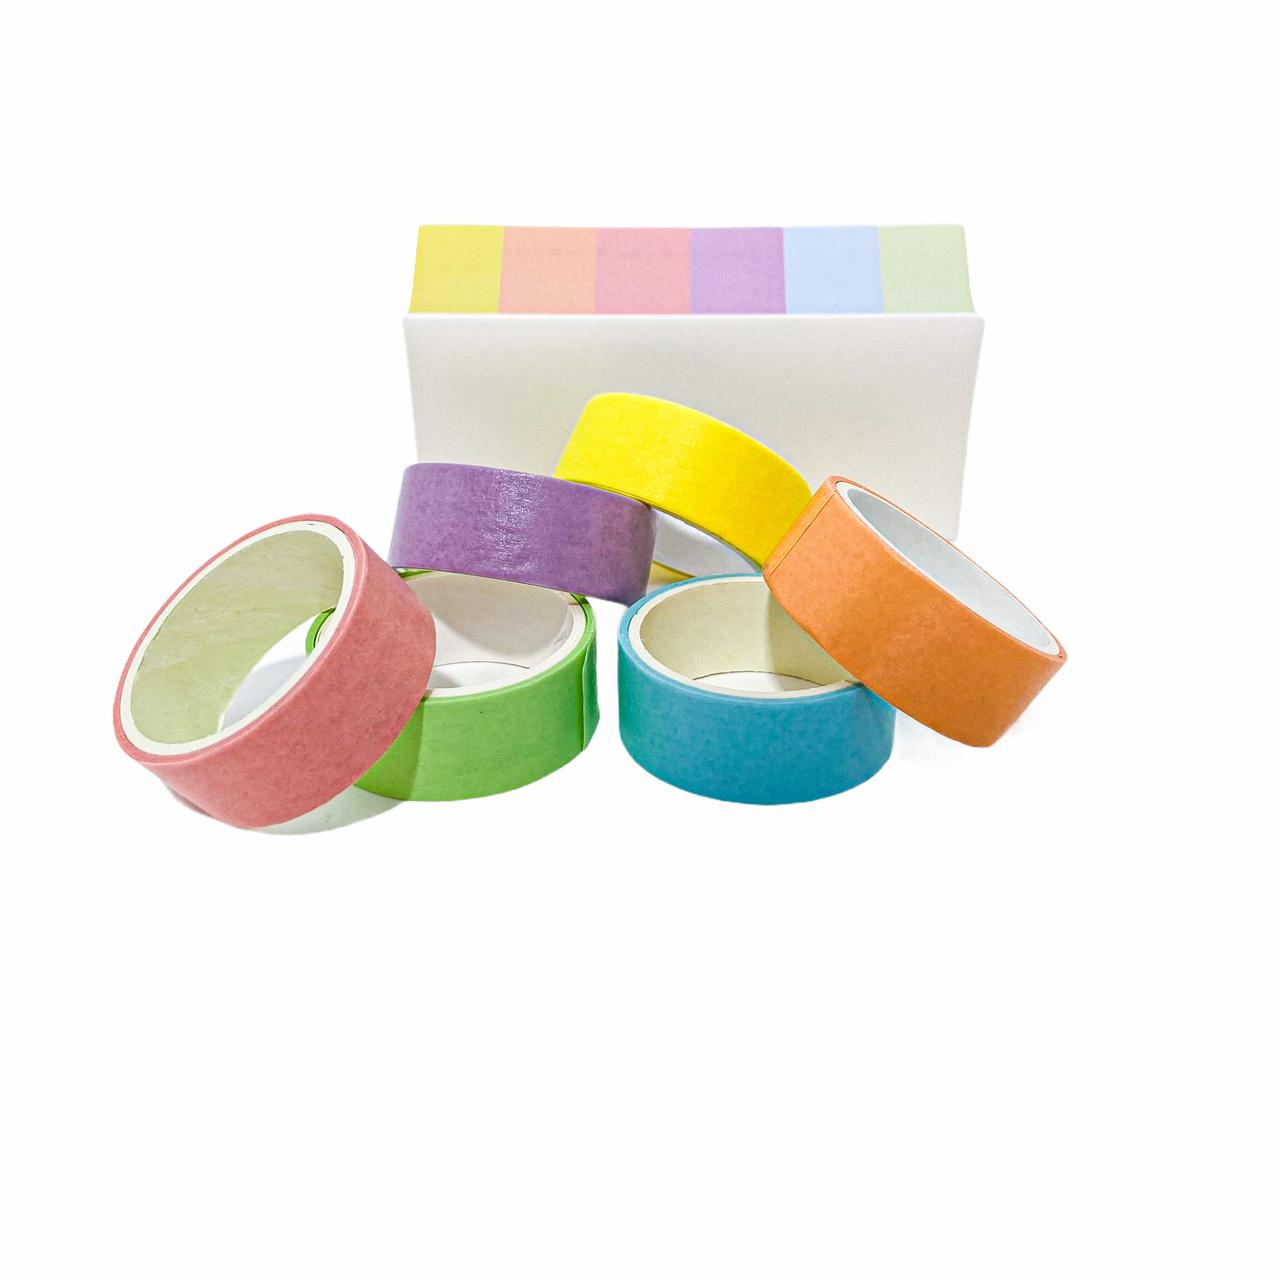 Kit com 8 Fitas Adesivas em Tons Pastel Moure Jar